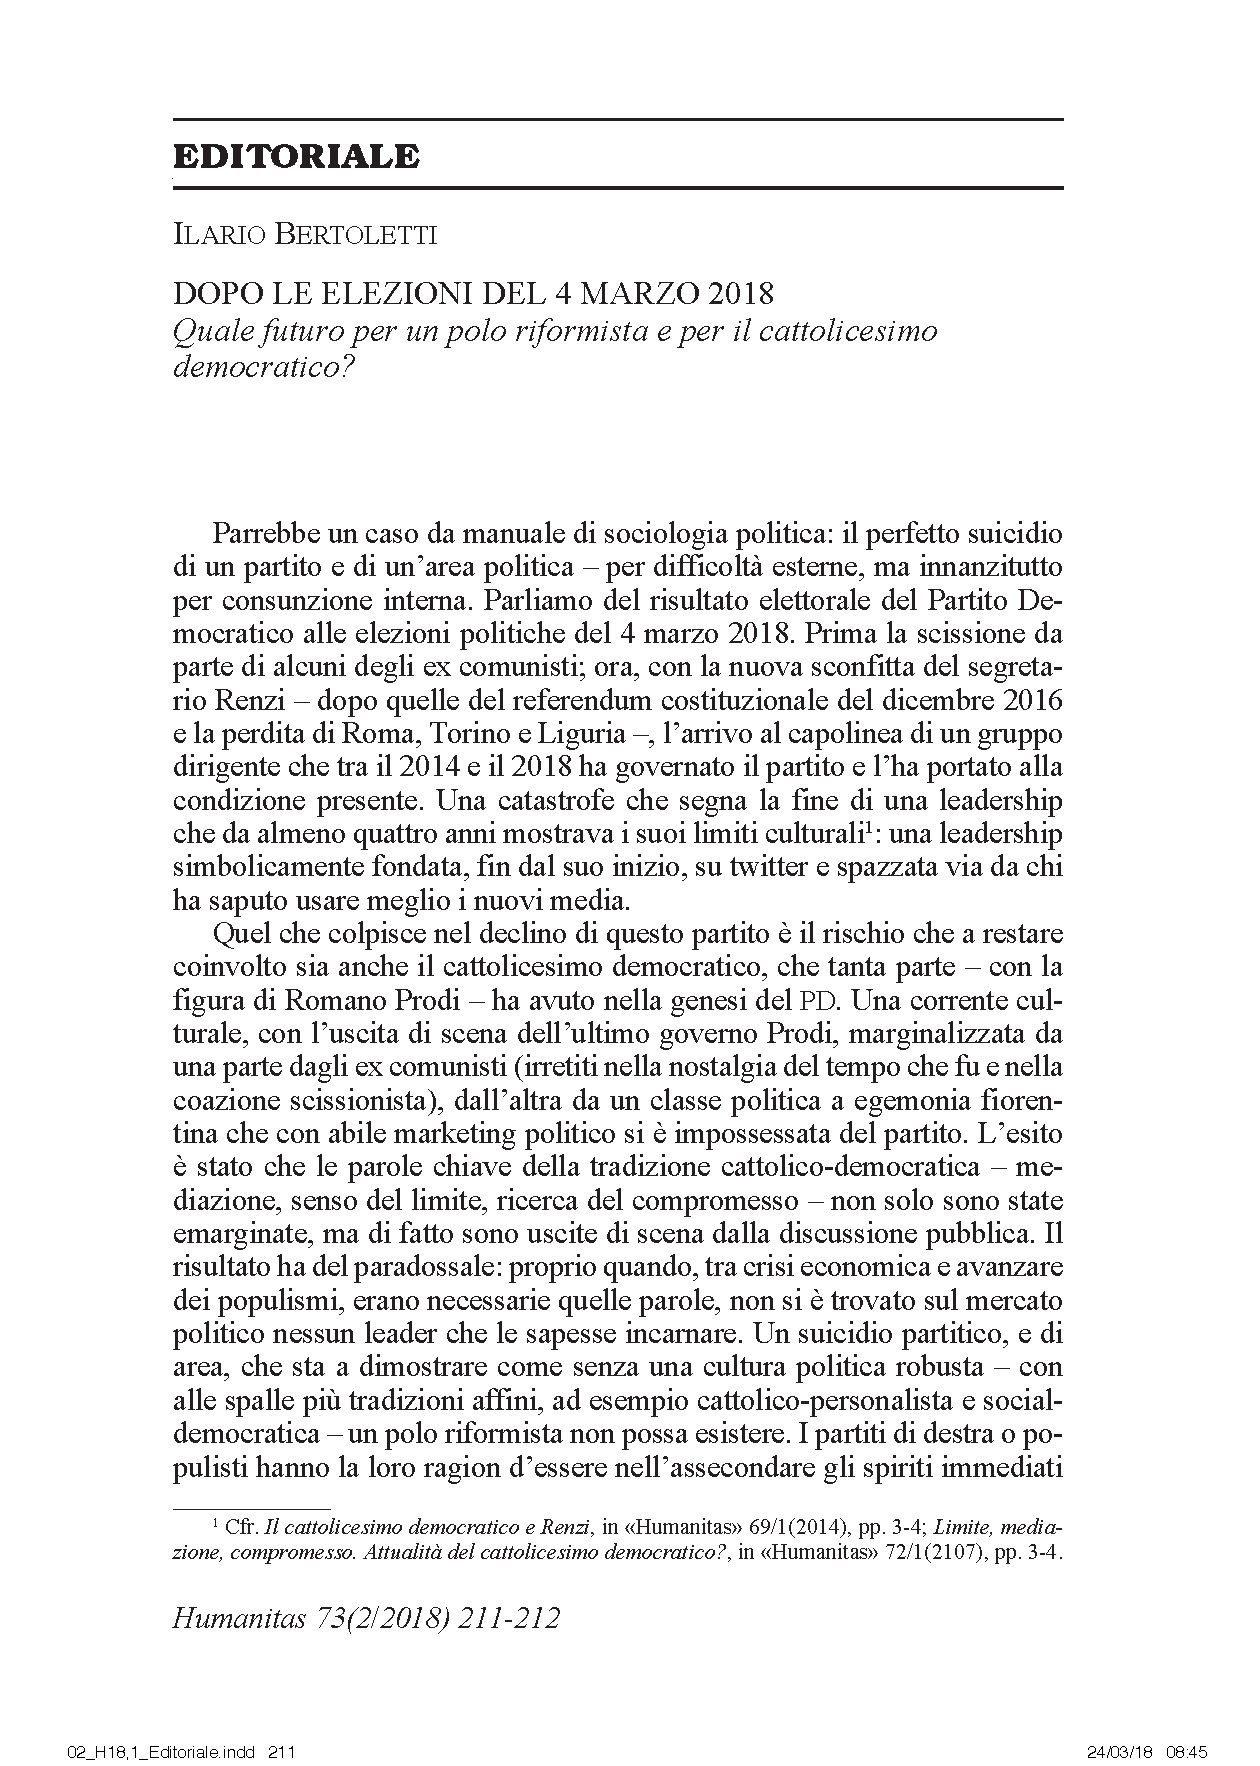 02_H181_Editoriale_Pagina_1.jpg